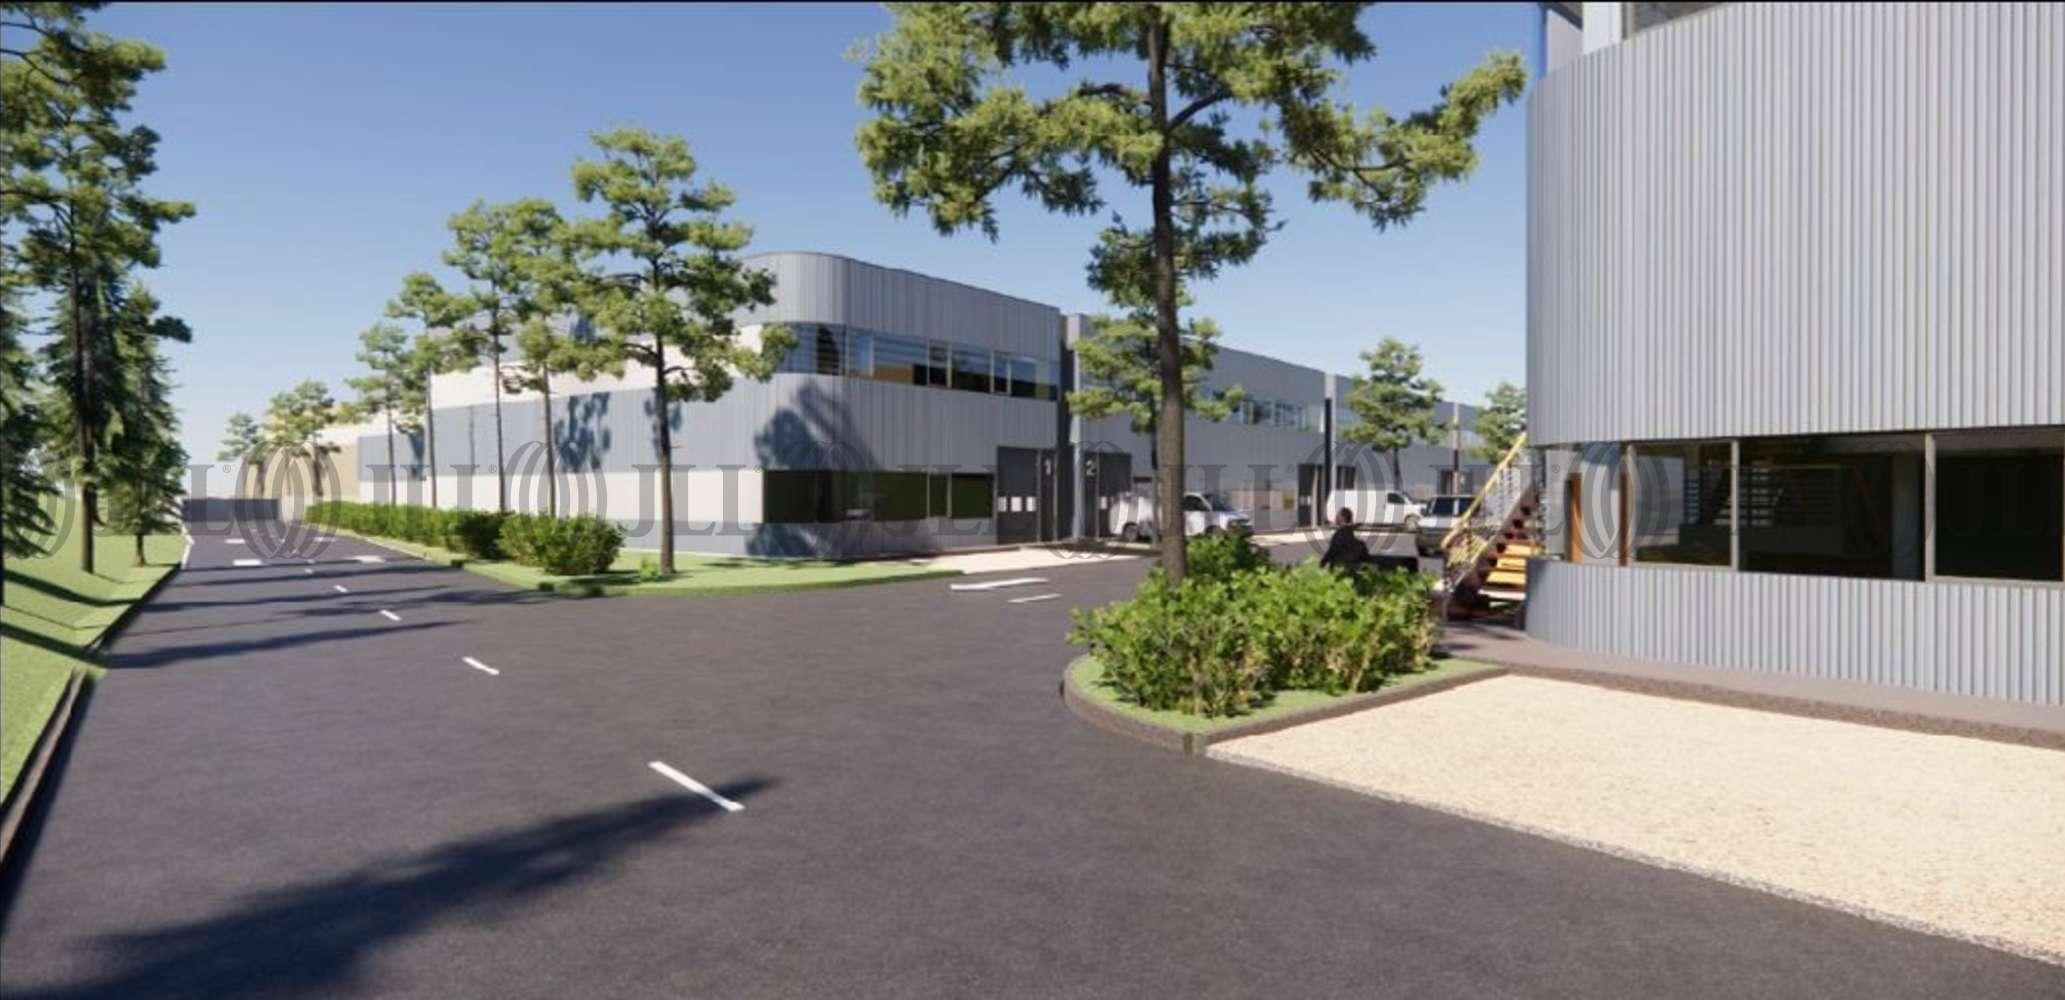 Activités/entrepôt La ciotat, 13600 - PARC CENTRAL - BATIMENT B